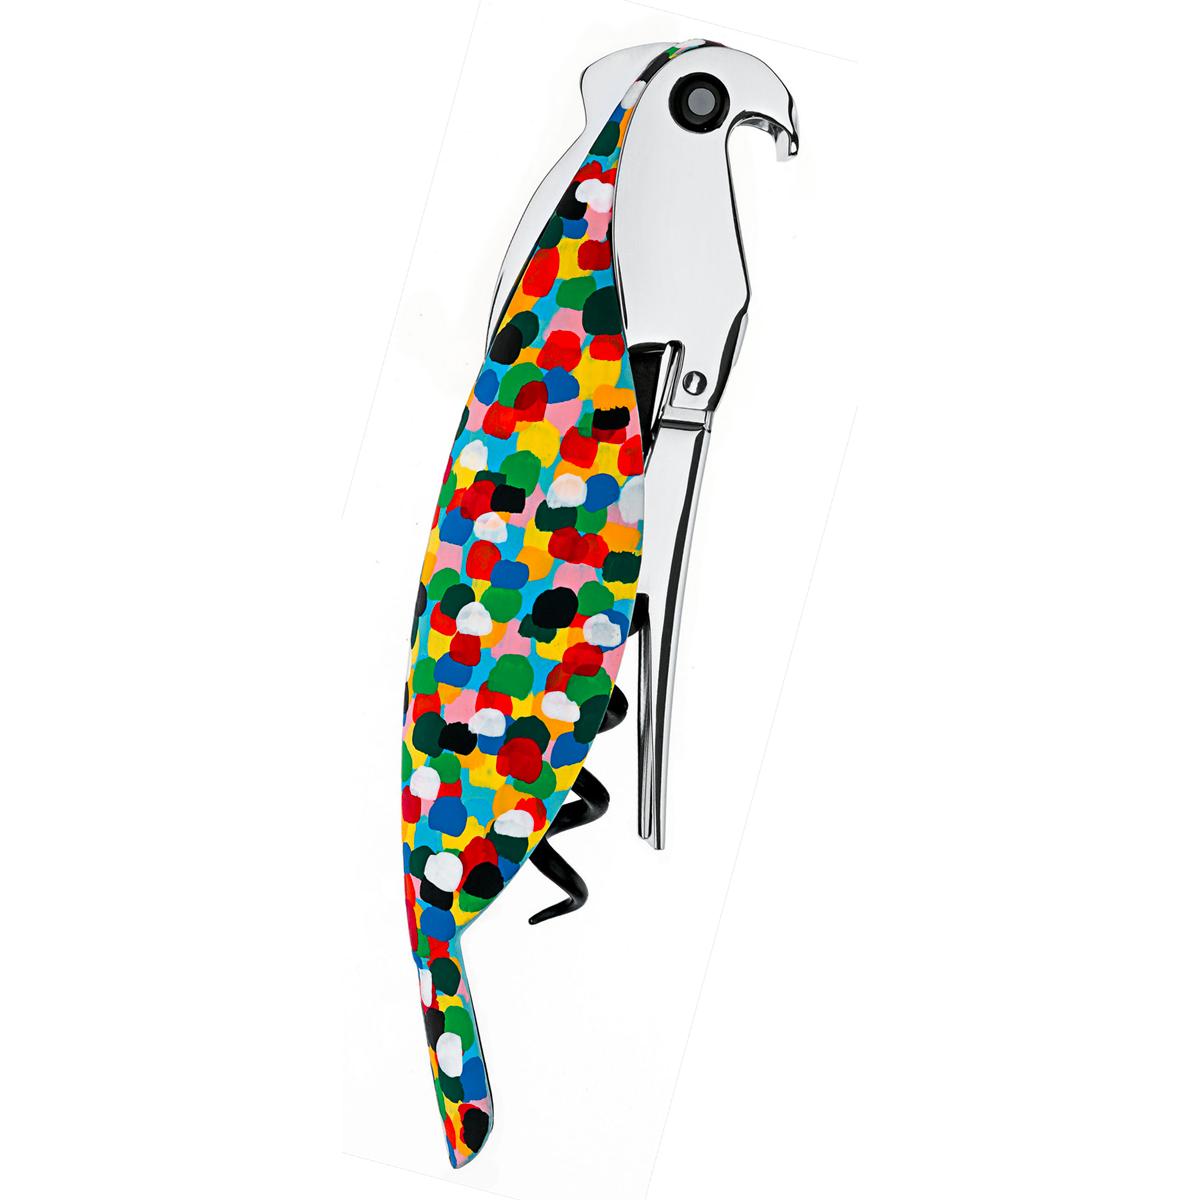 ALESSI PARROT PROUST Sommelier Corkscrew - handpainted | the design gift shop